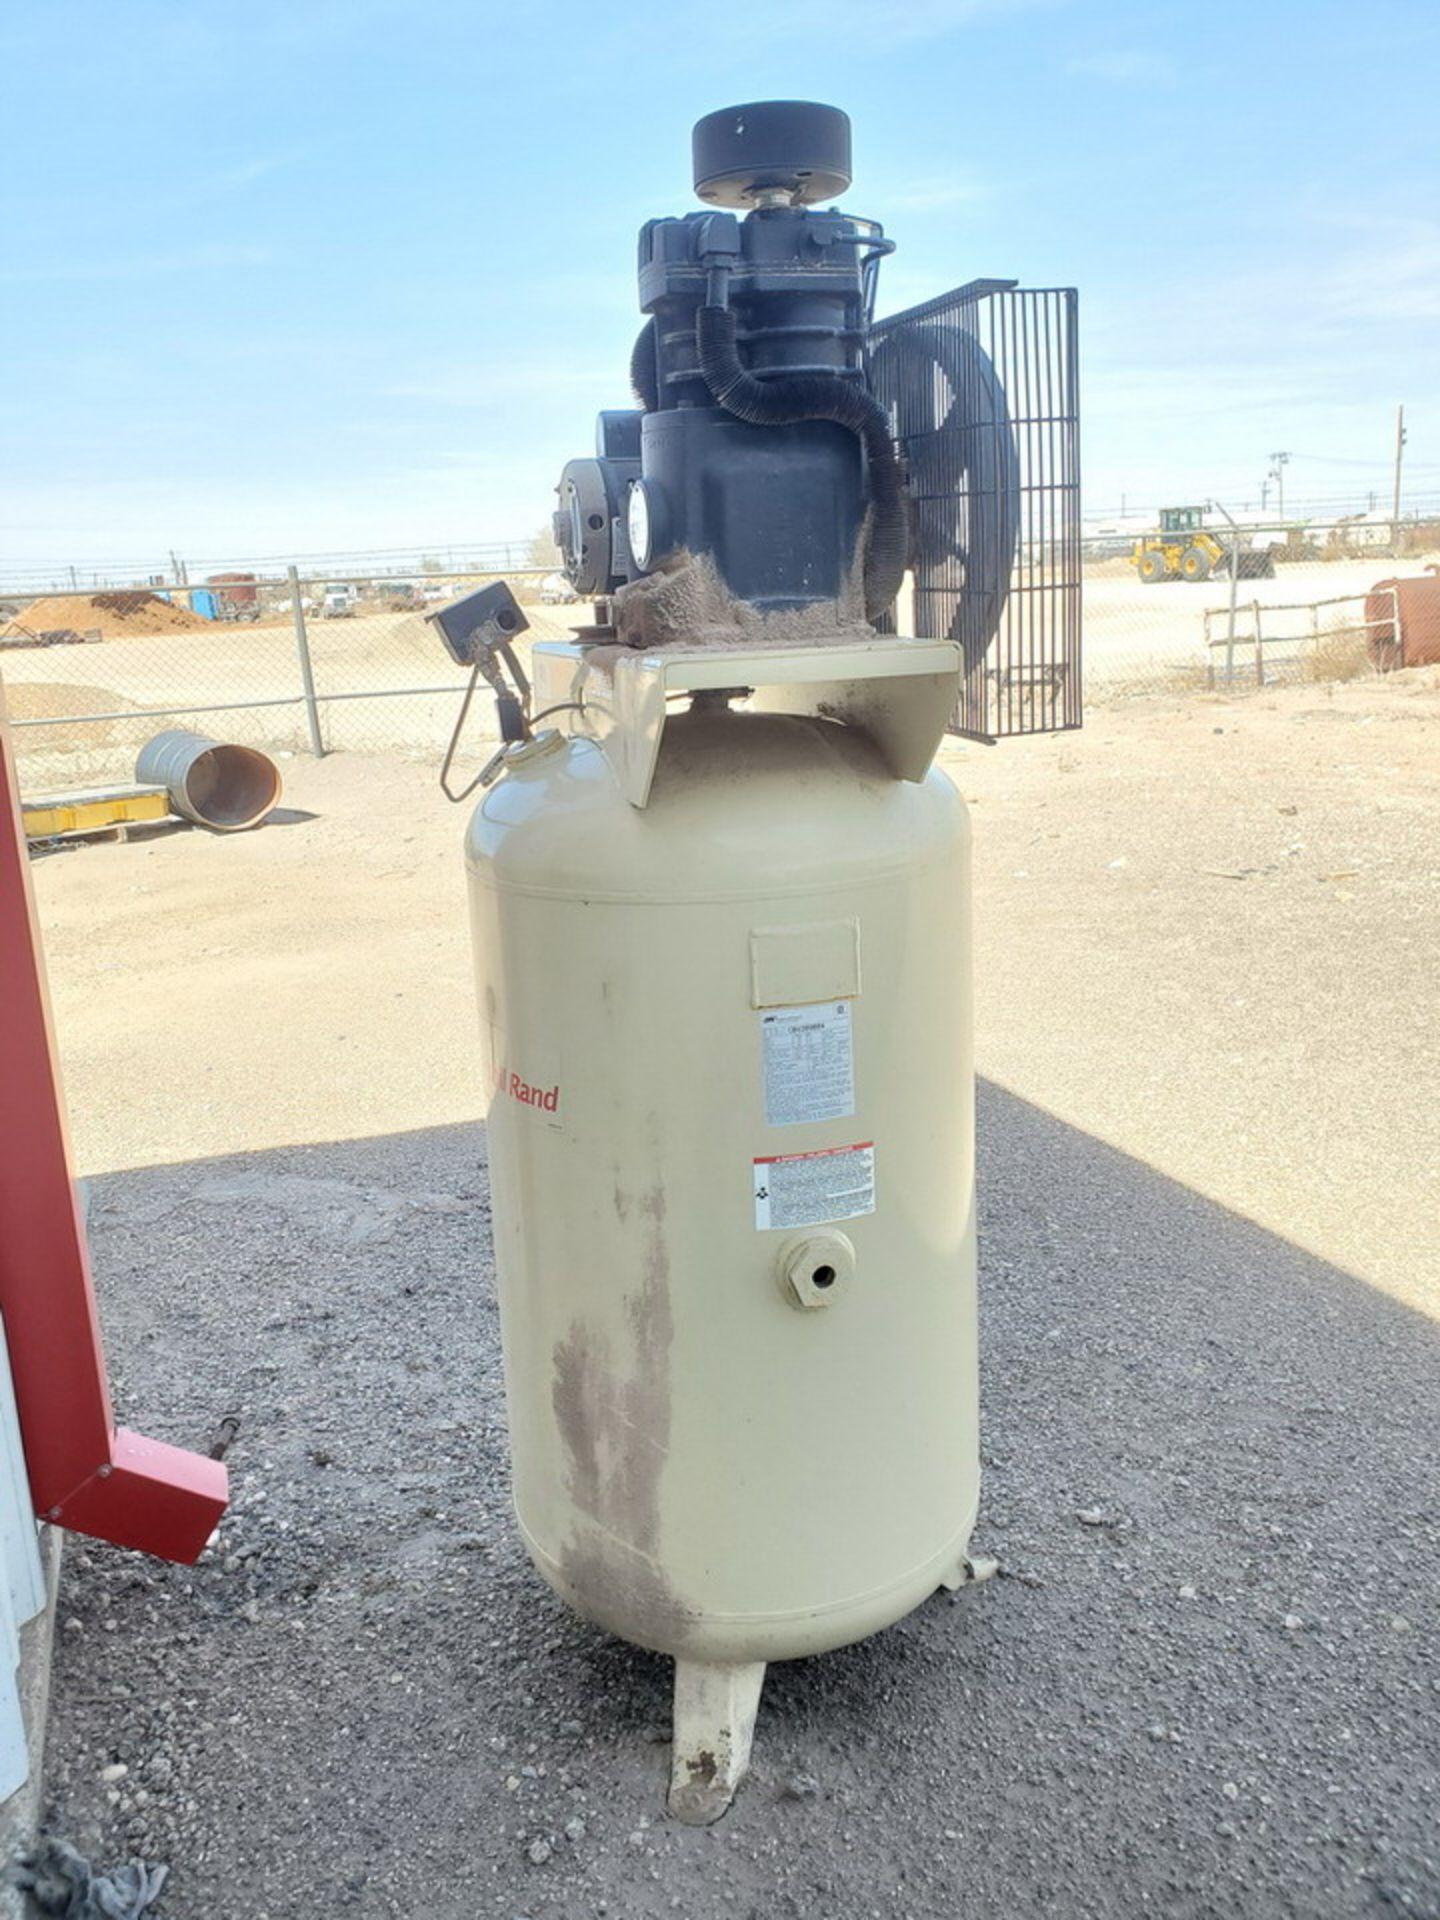 IR TS4N5 Air Compressor 230V, 1PH, 60HZ, MAWP-175psi - Image 5 of 9